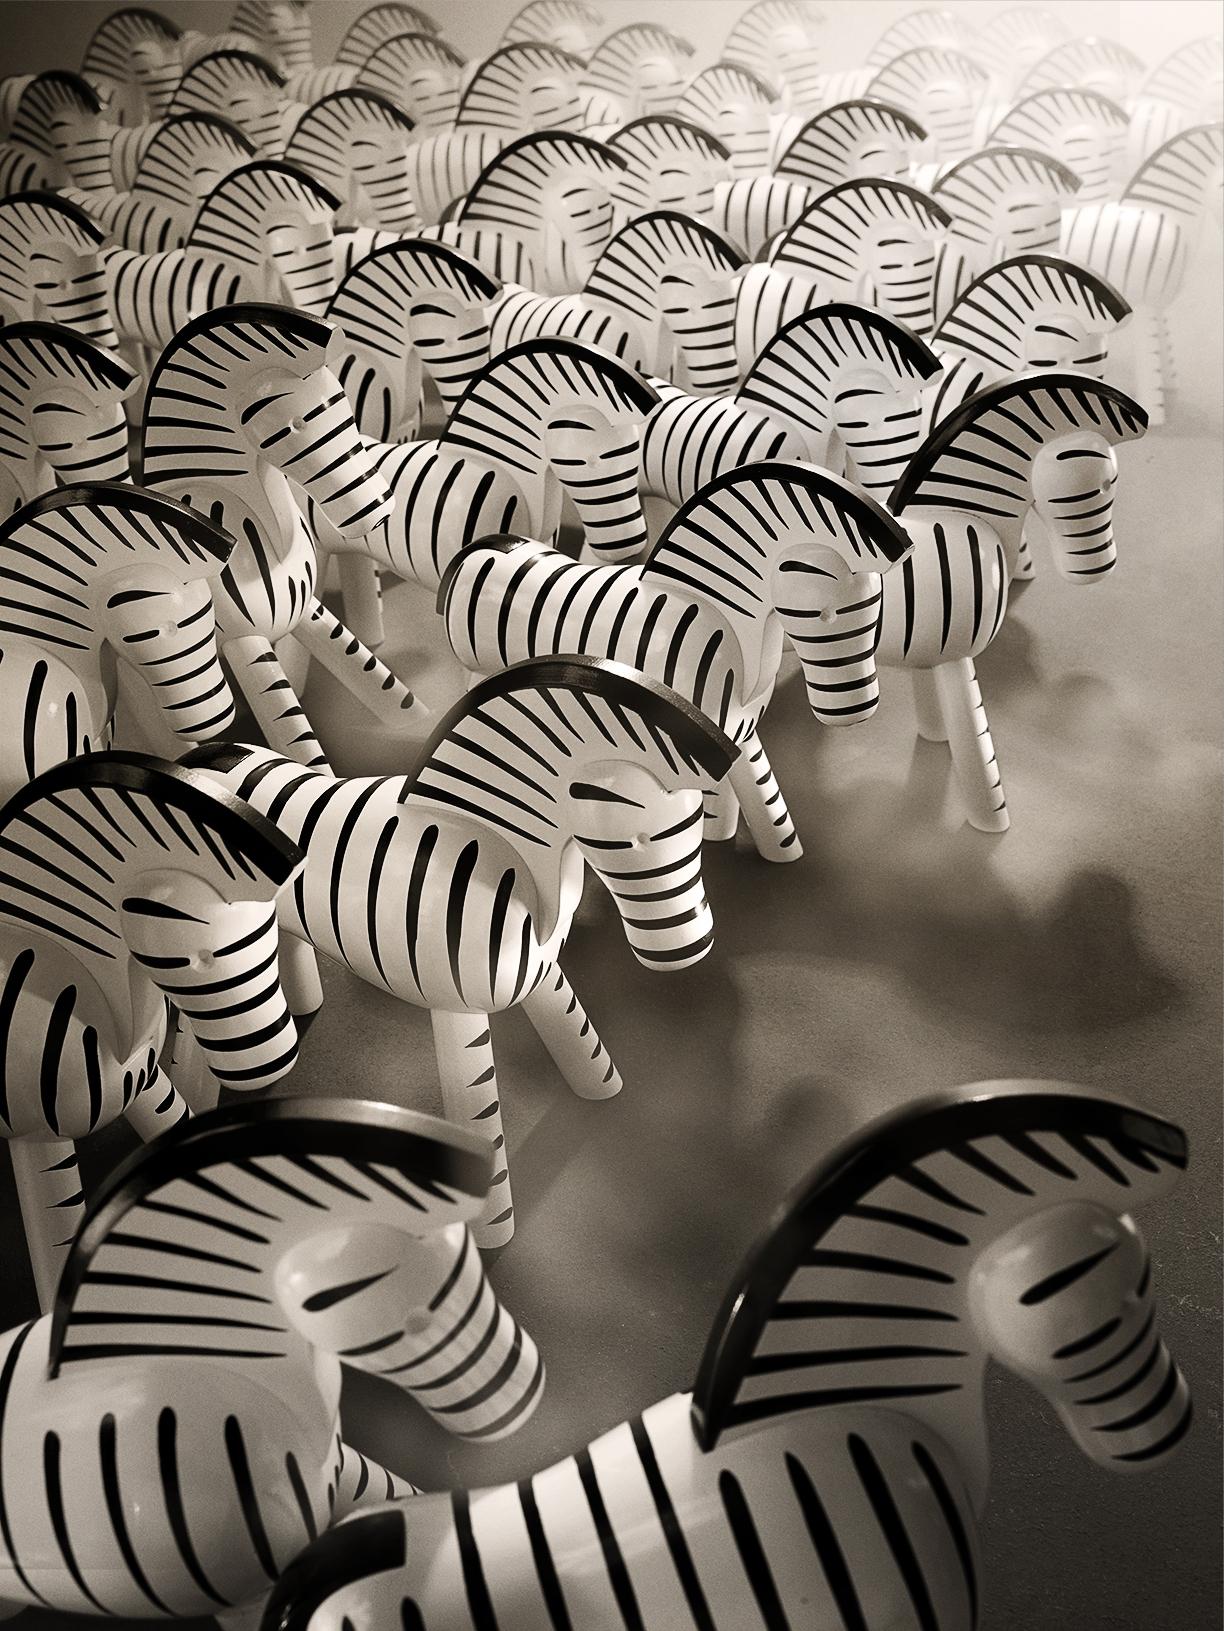 Wooden Zebras. Hagedornhagen's interpretation of the original drawings by Kaj Bojesen a Scandinavian icon.